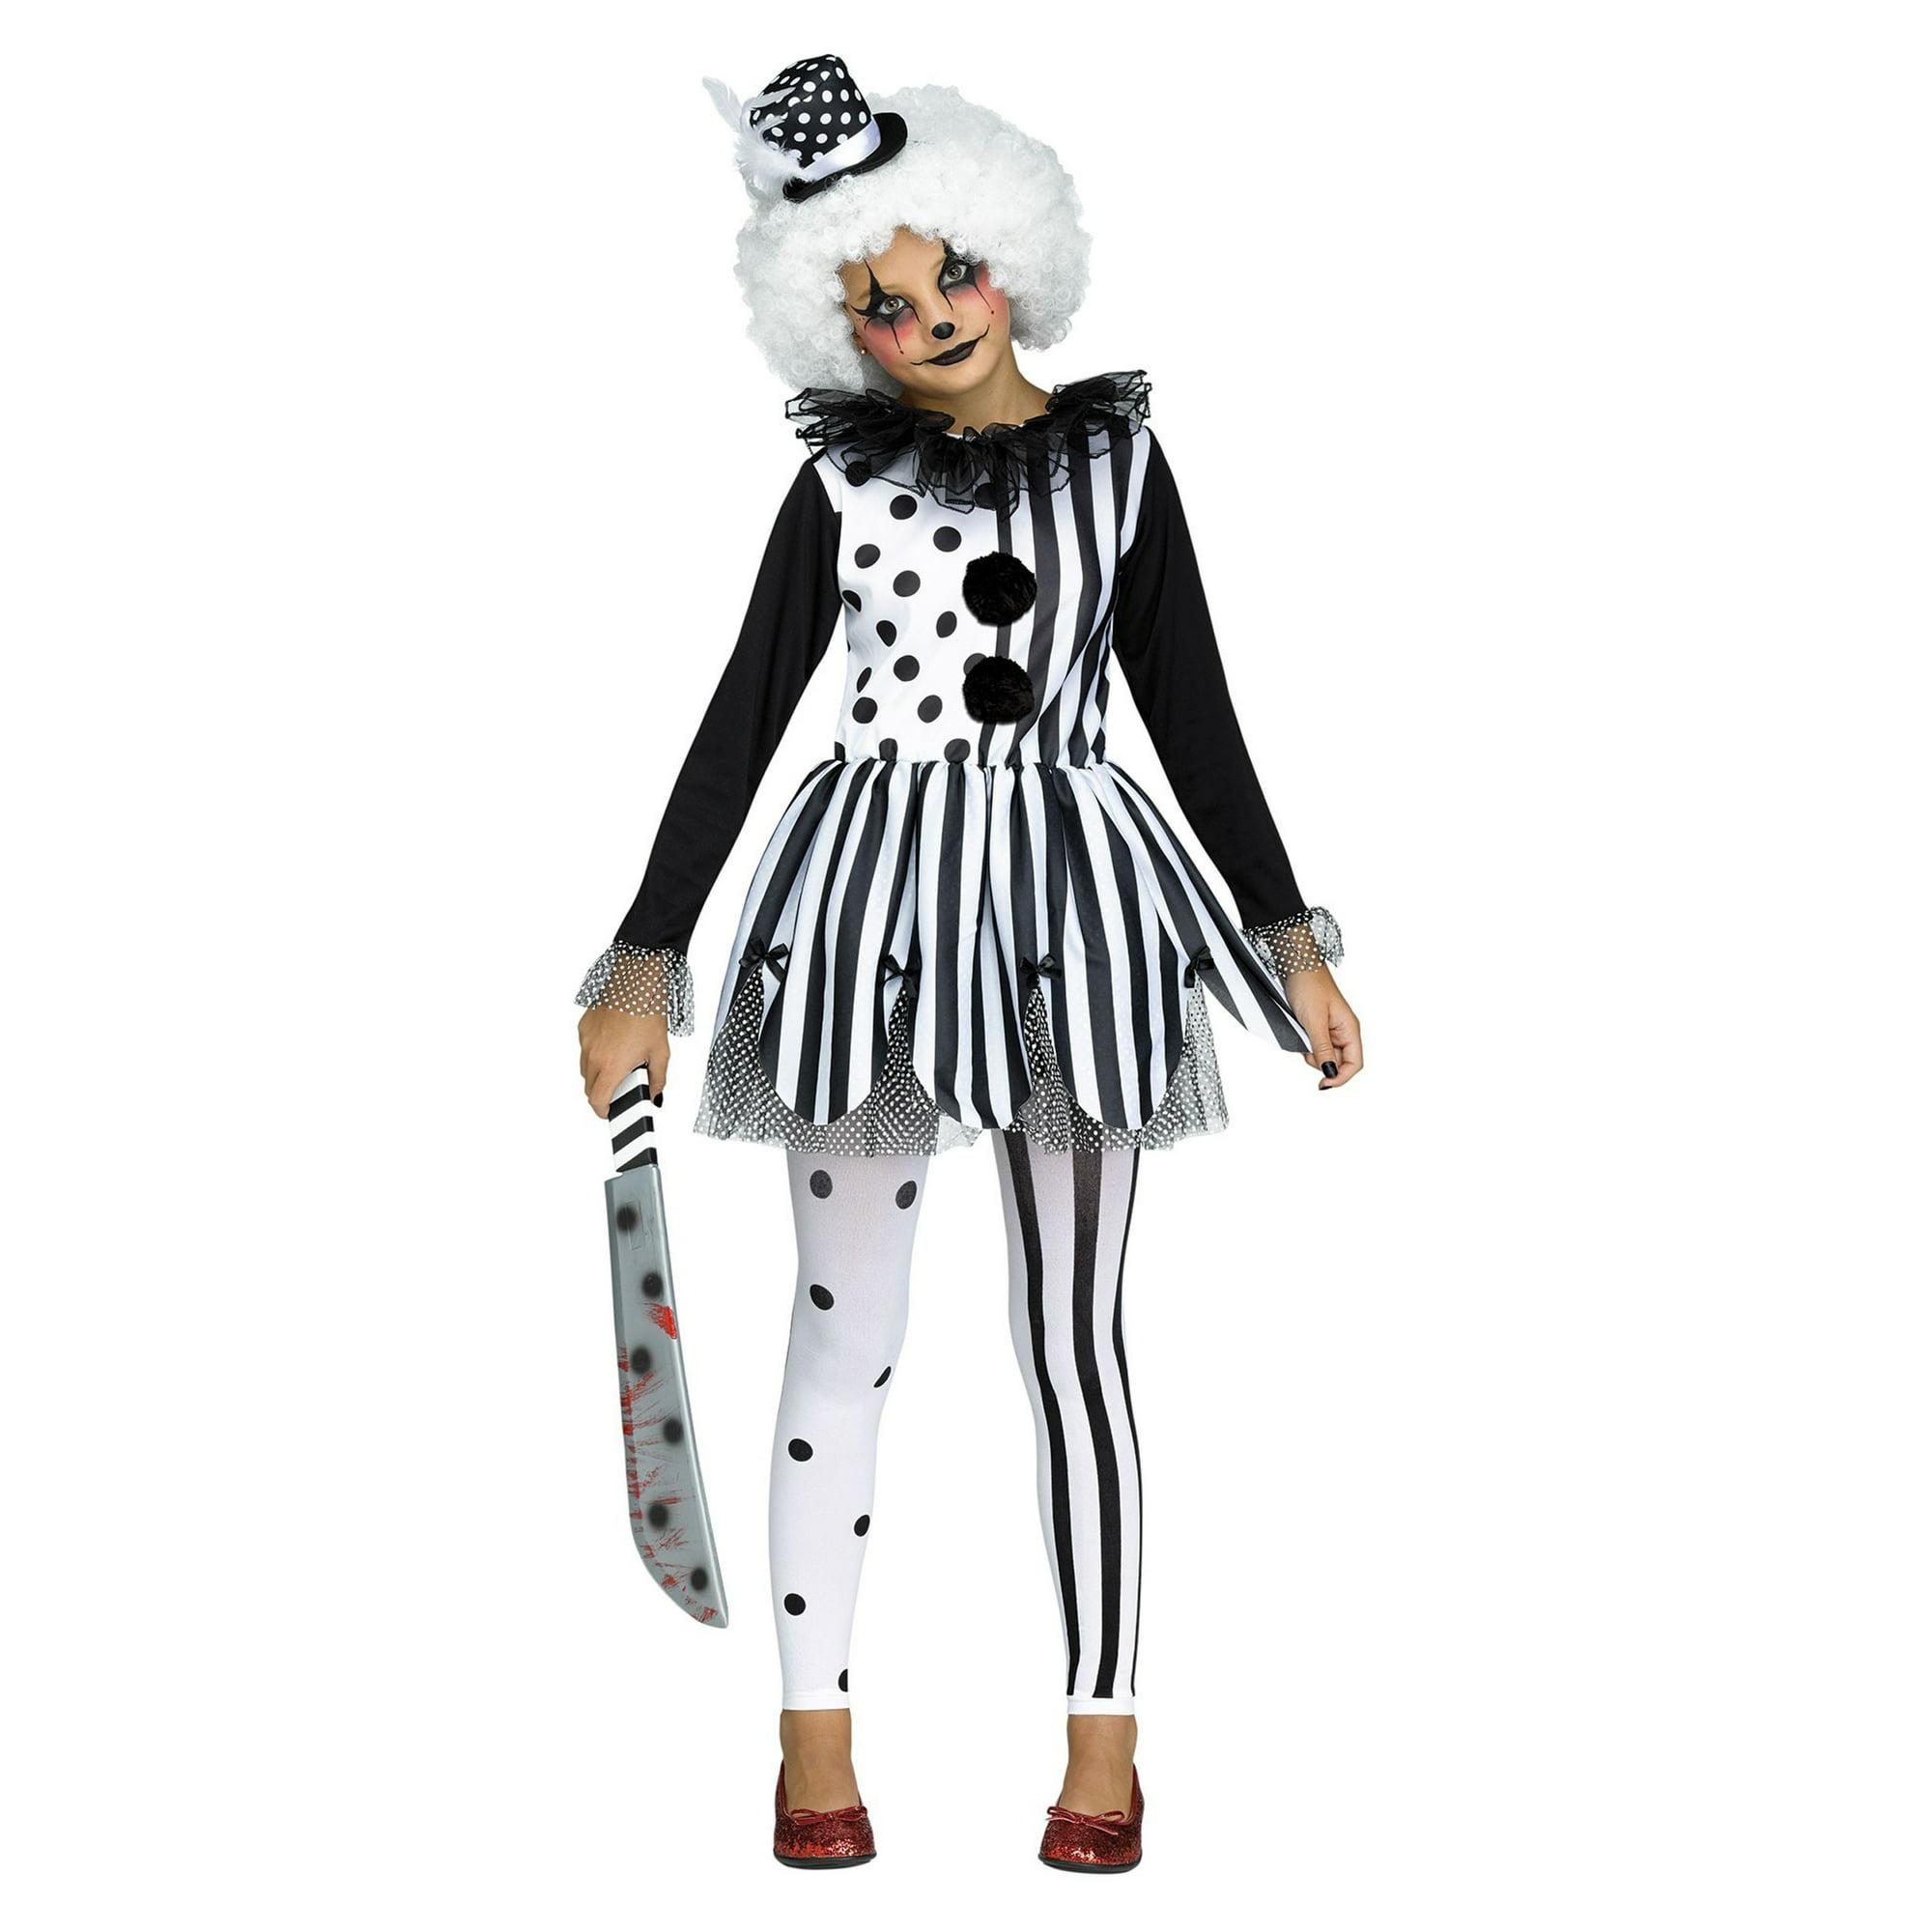 Clown Halloween Costumes For Girls.Killer Clown Girls Costume Walmart Canada